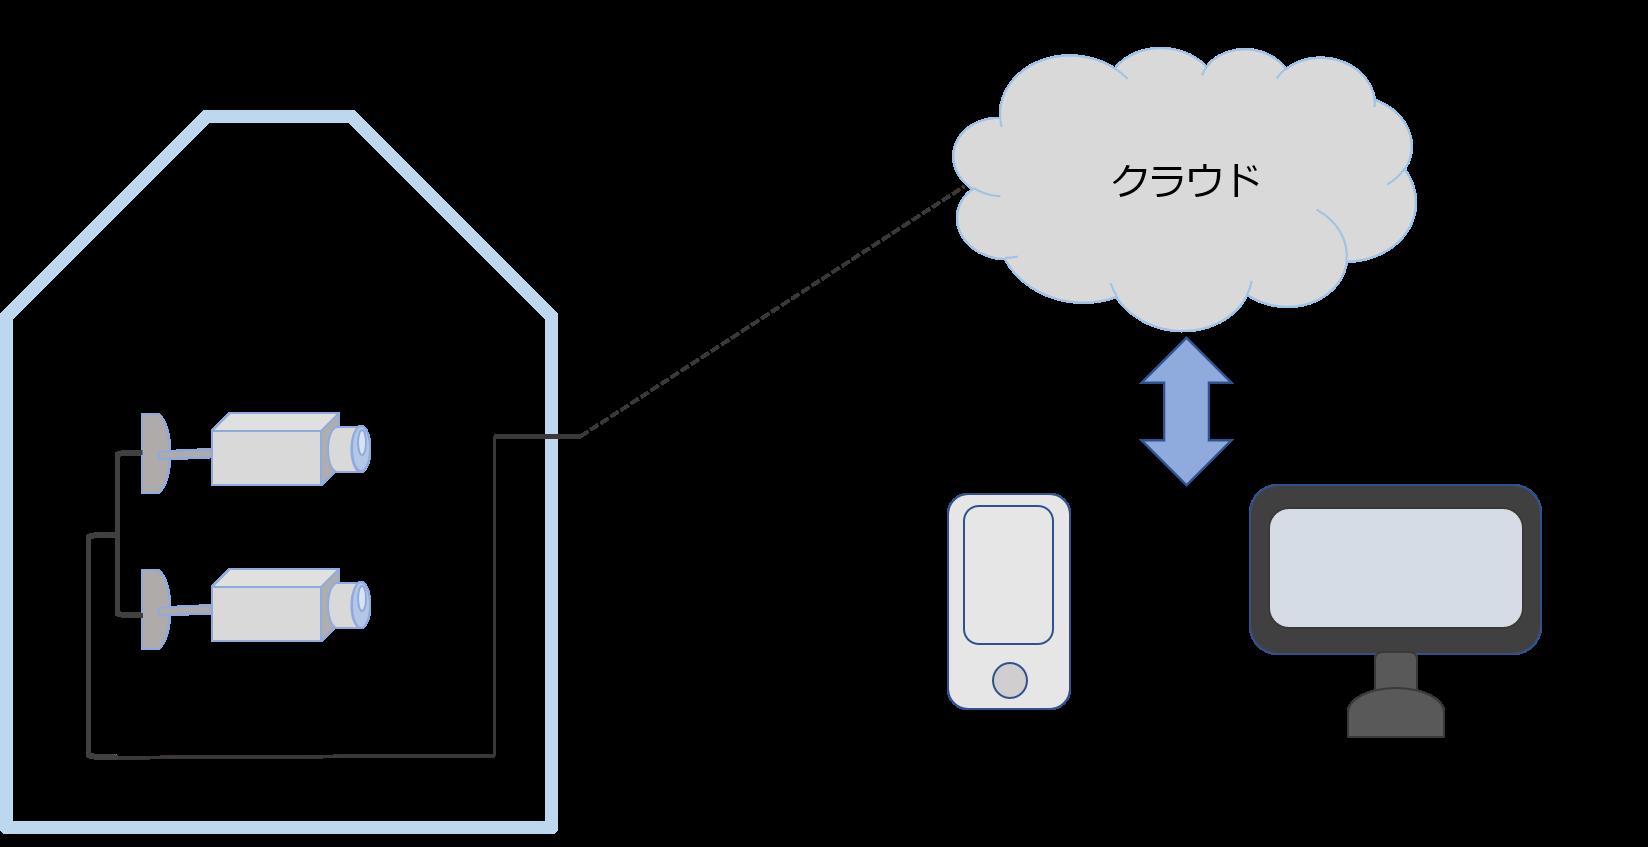 クラウドカメライメージ図